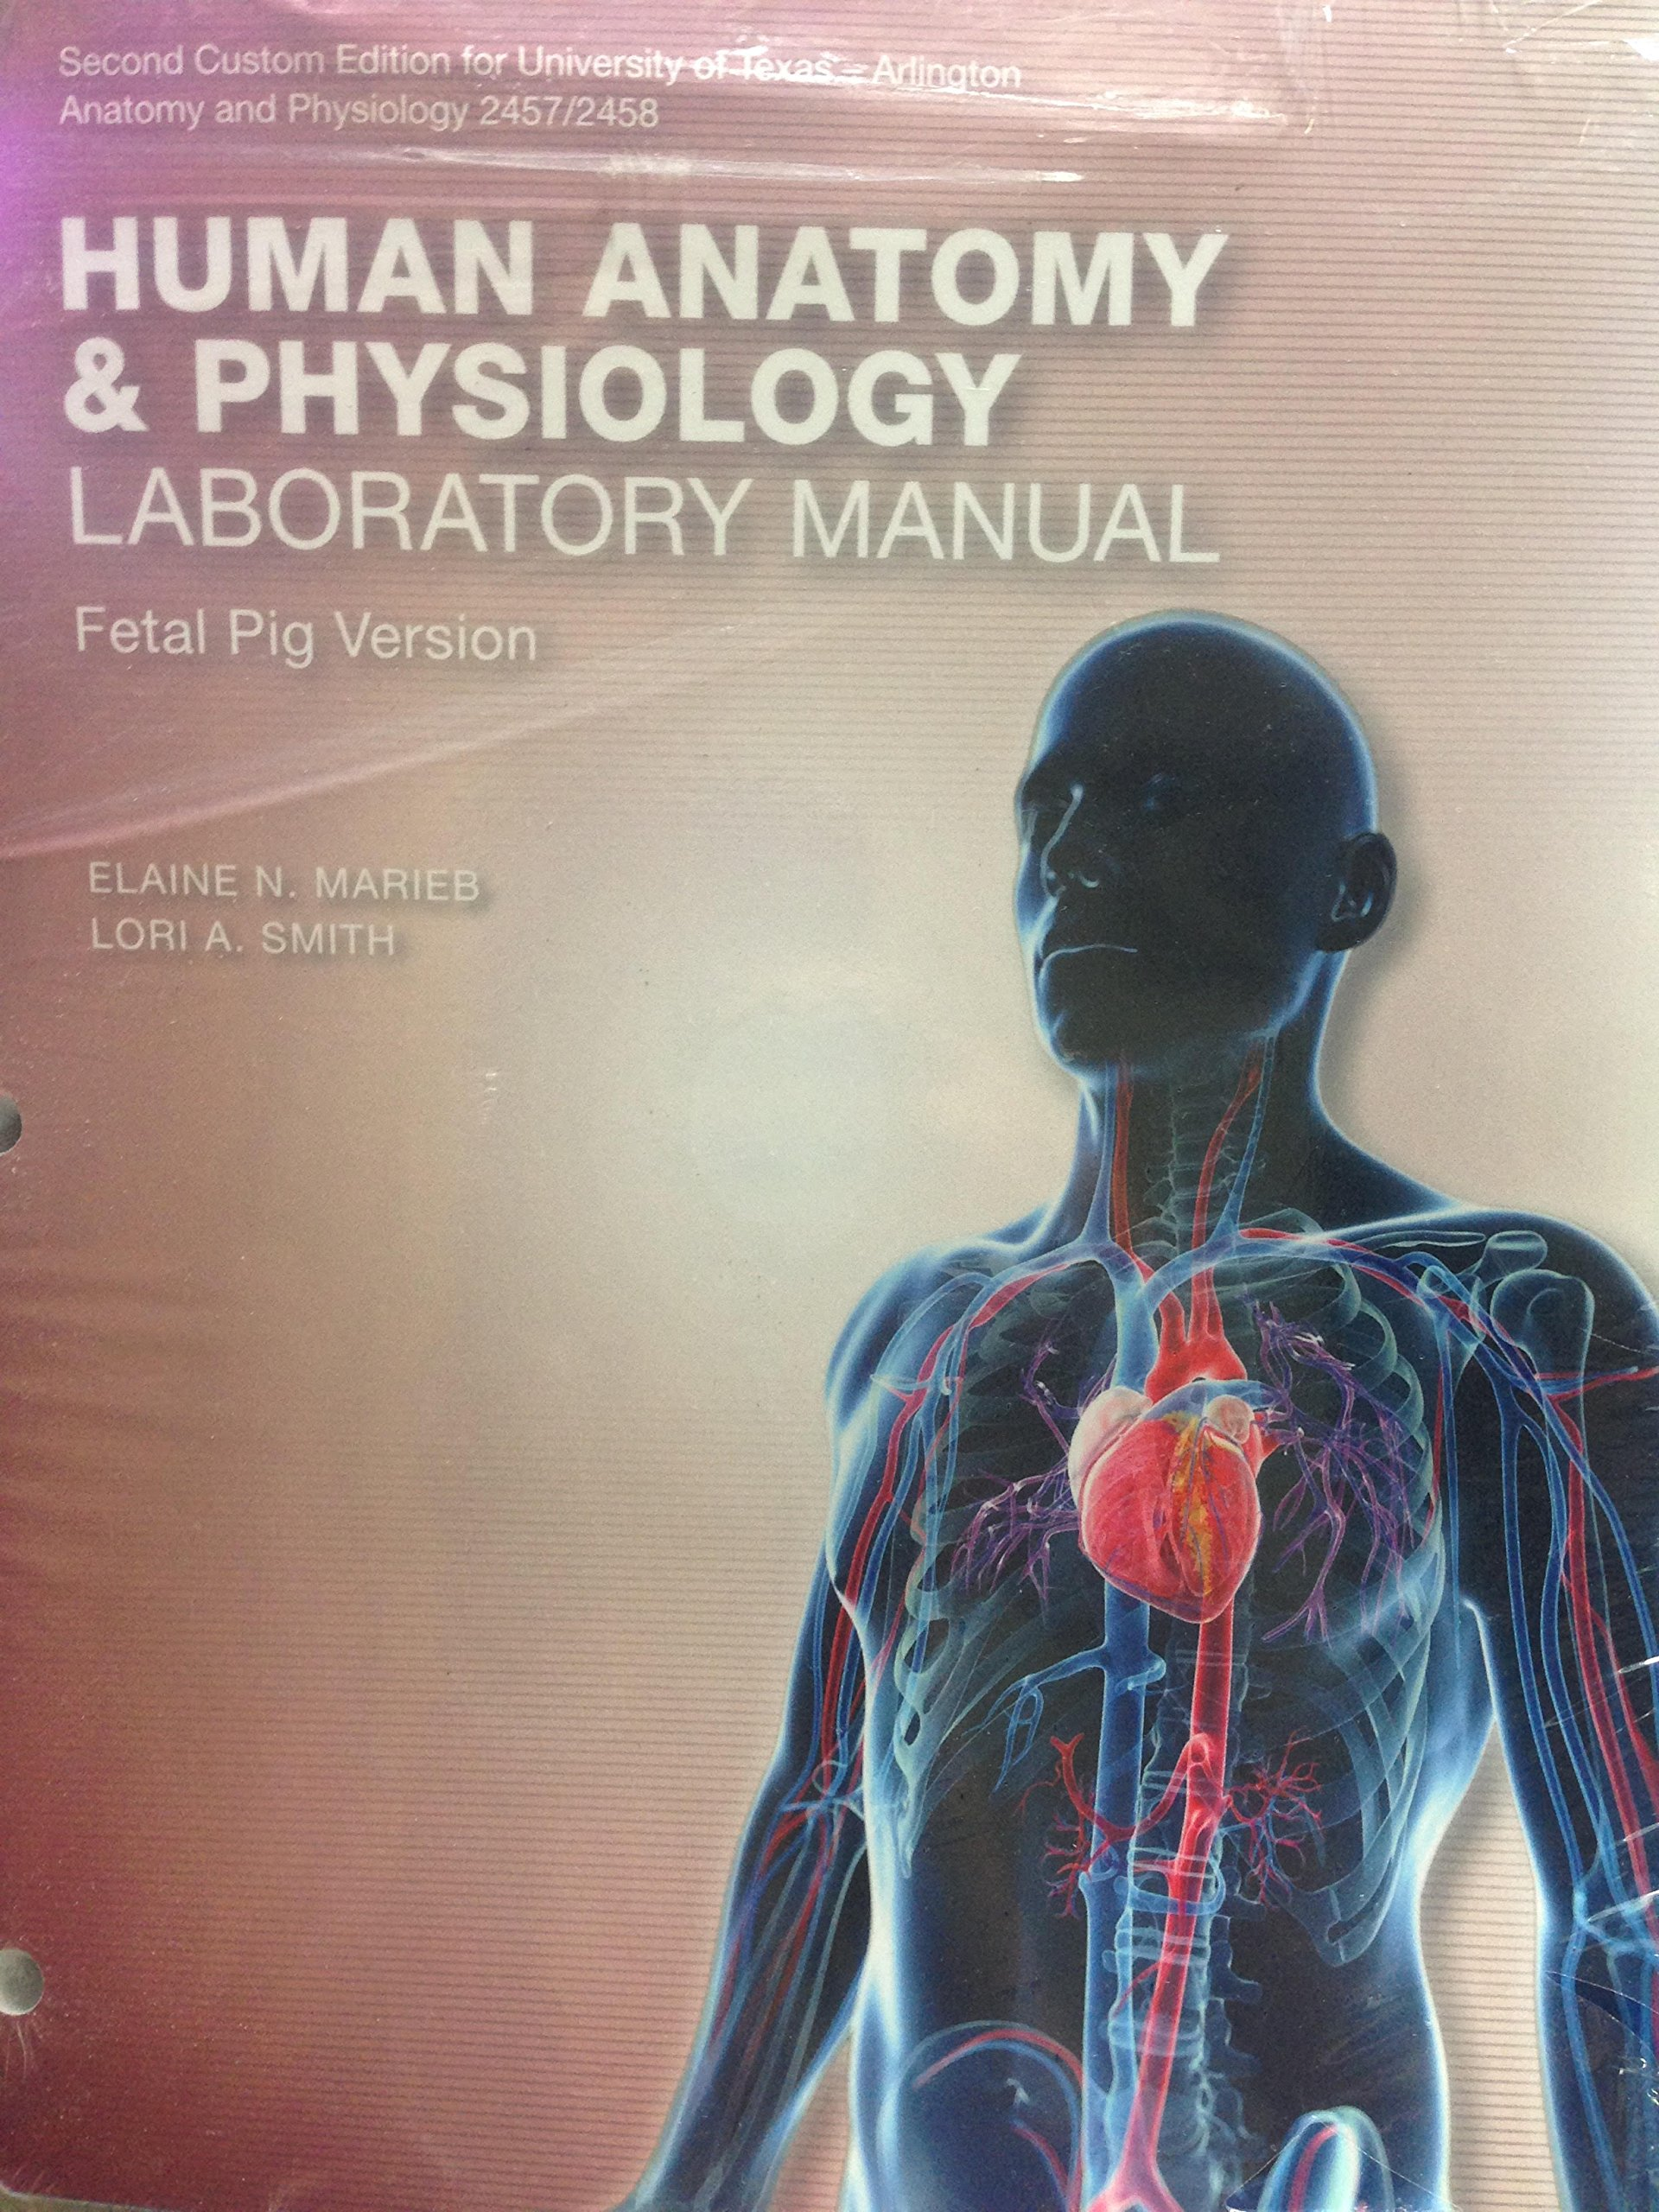 Human Anatomy & Physiology Laboratory Manual, Fetal Pig Version, Custom  Edition for University of Texas - Arlington, Anatomy and Physiology  2457/2458, ...